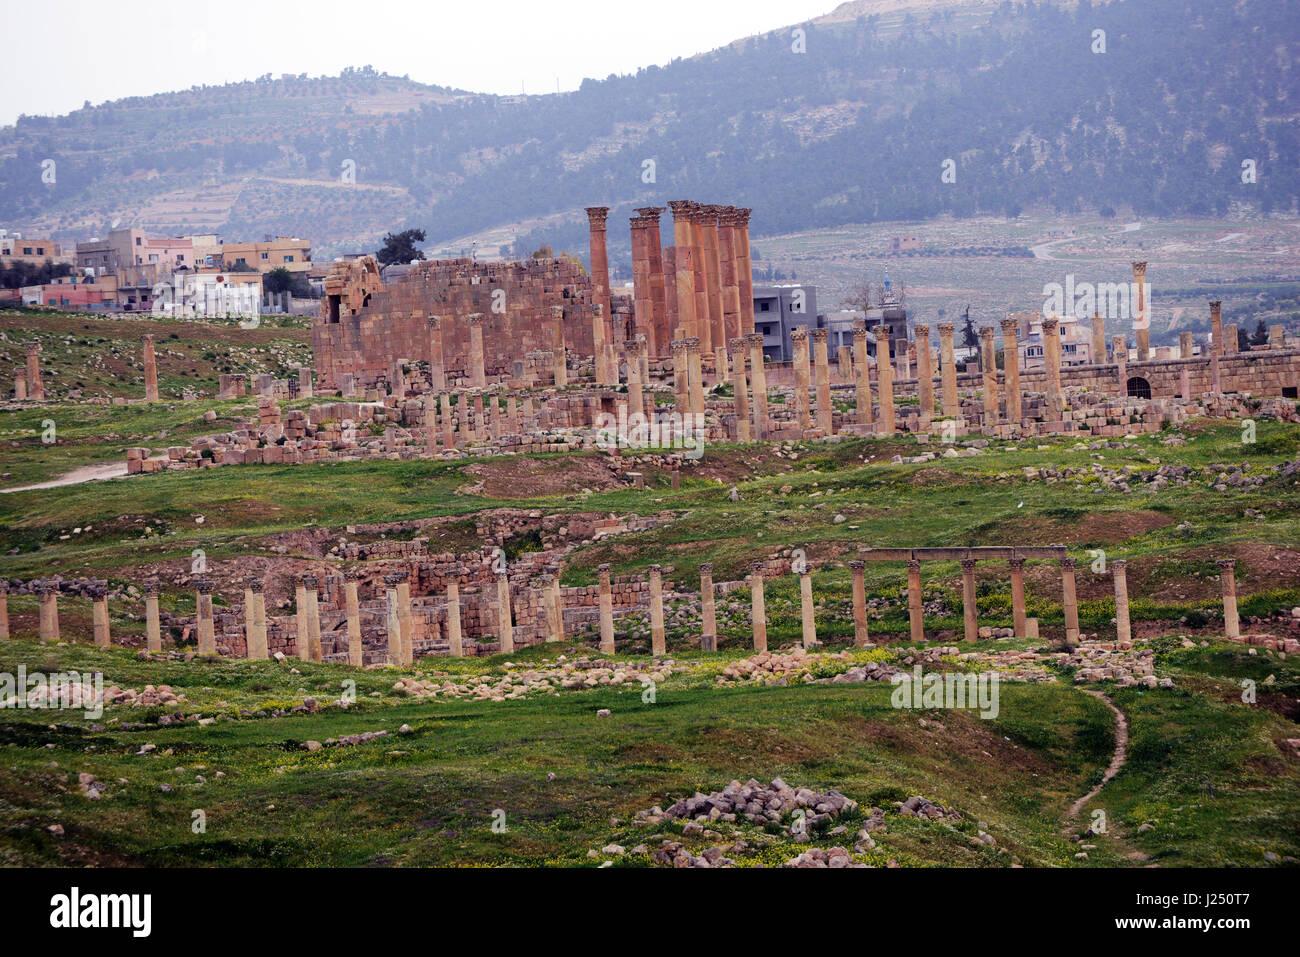 The temple of Zeus in the ancient Roman city of Jerash in Jordan. - Stock Image